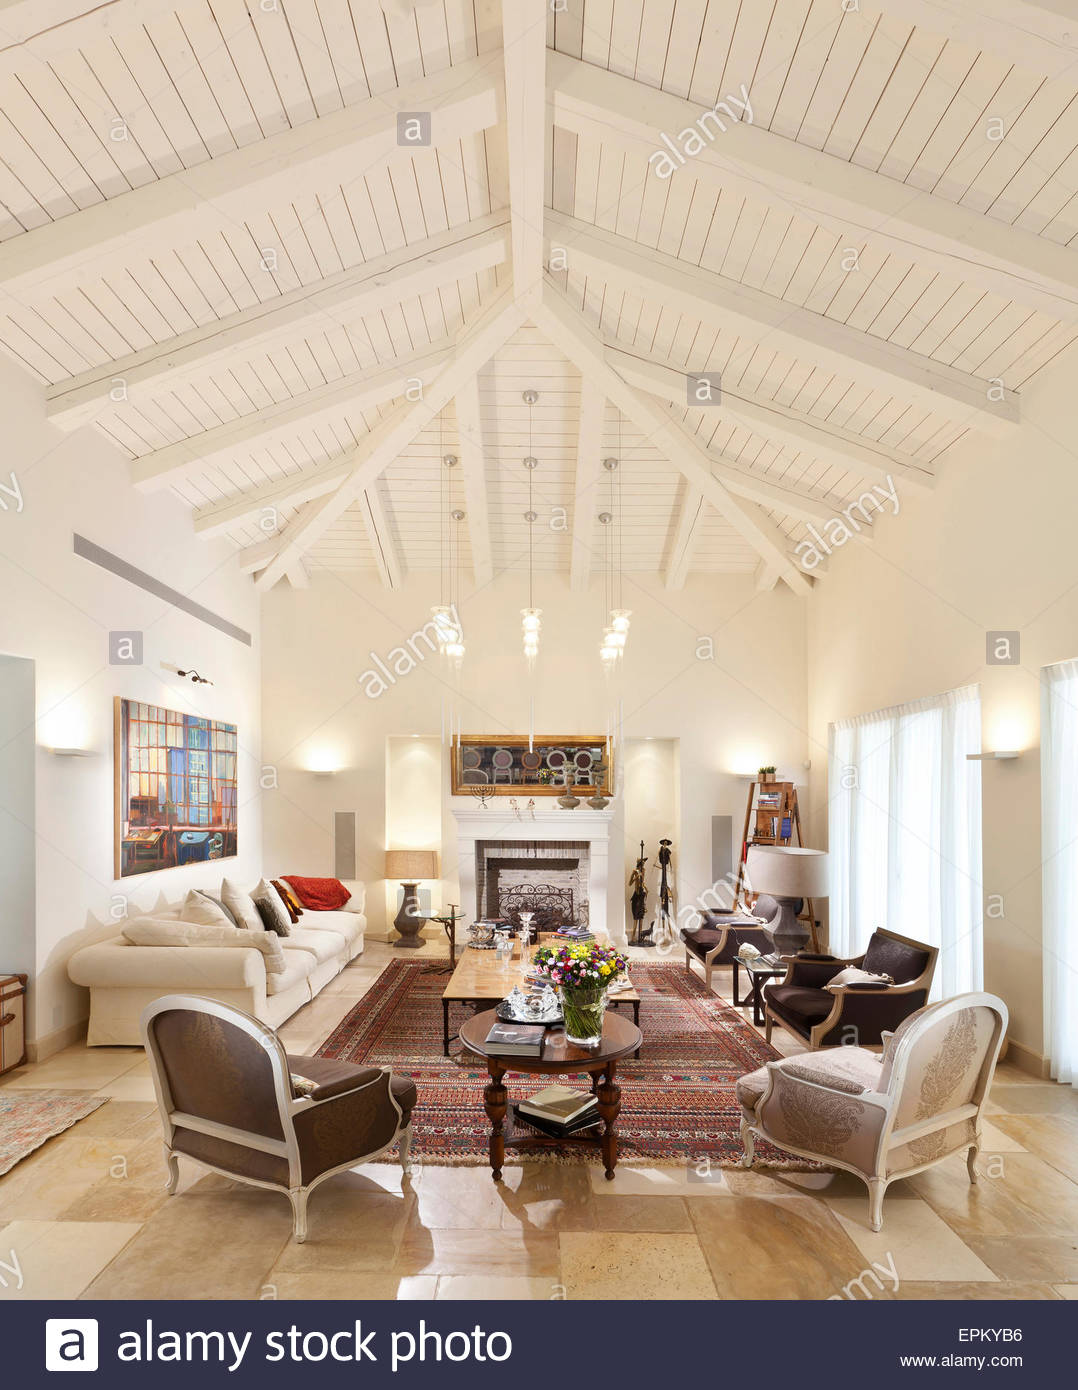 Roof Lighting Interiors Stock Photos & Roof Lighting Interiors Stock ...